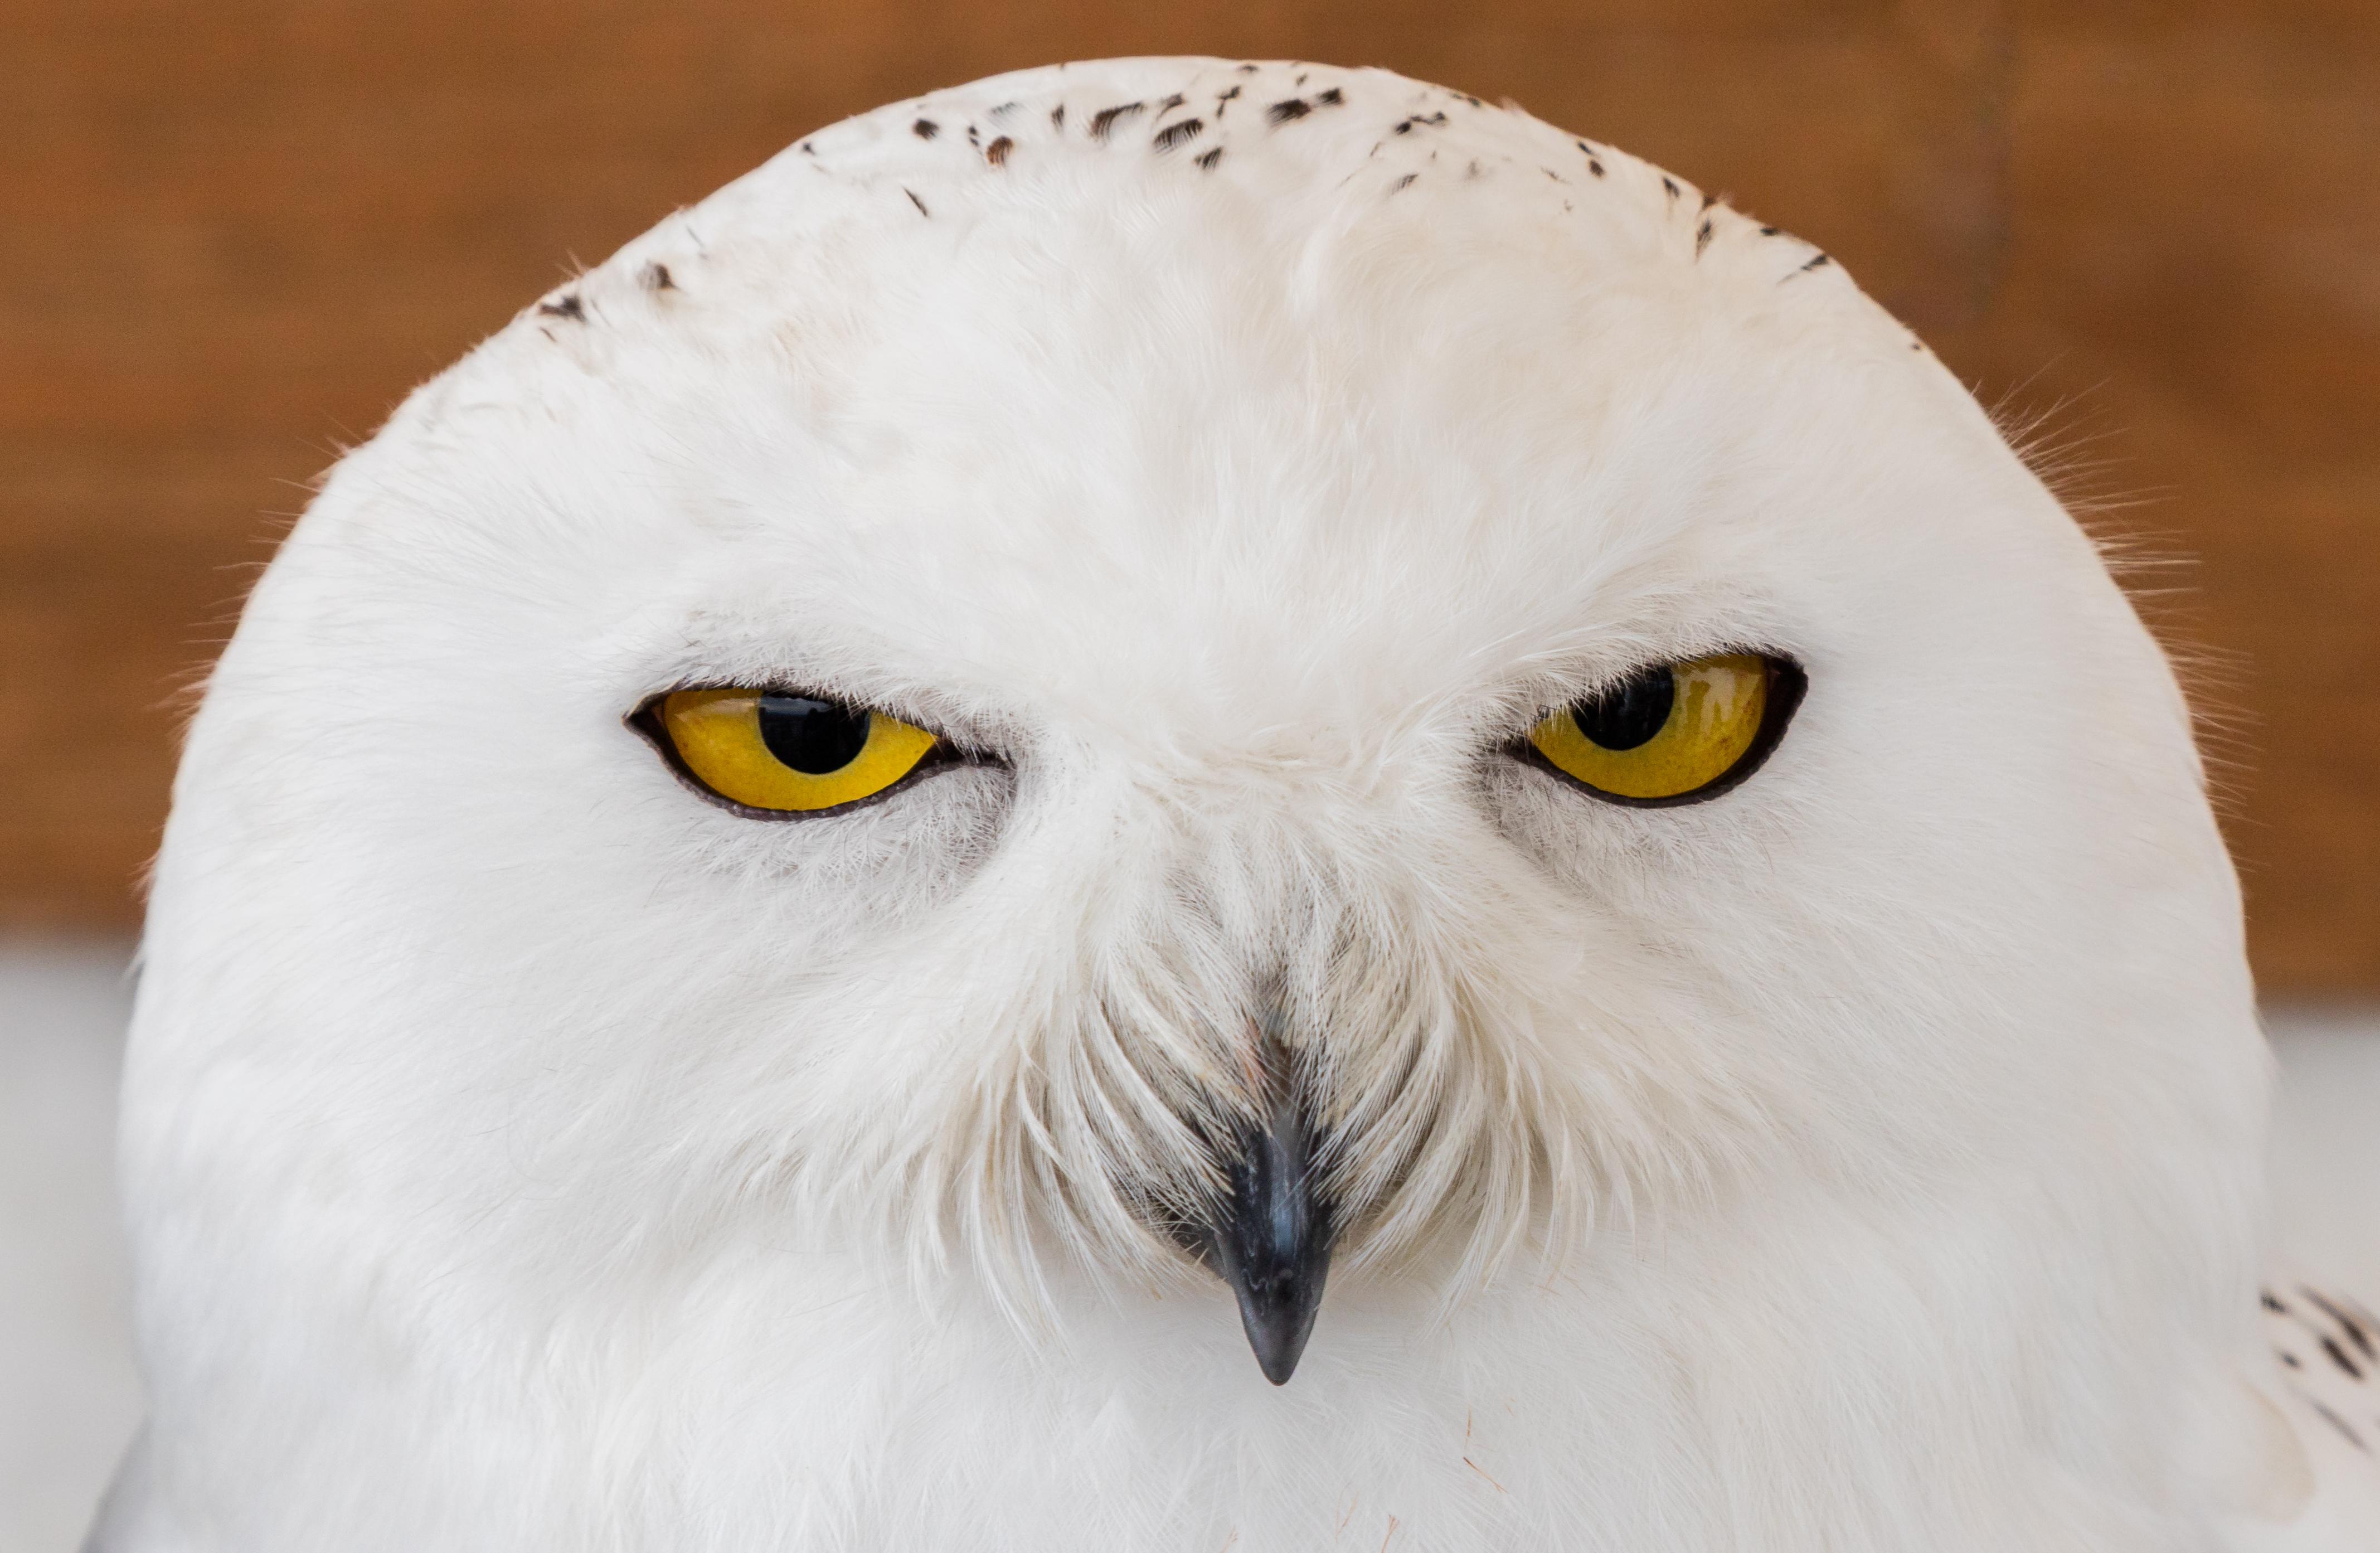 File:B%C3%BAho_nival_(Bubo_scandiacus),_Arcos_de_la_Frontera,_C%C3%A1diz,_Espa%C3%B1a,_2015 12 08,_DD_03 on Snowy Owls